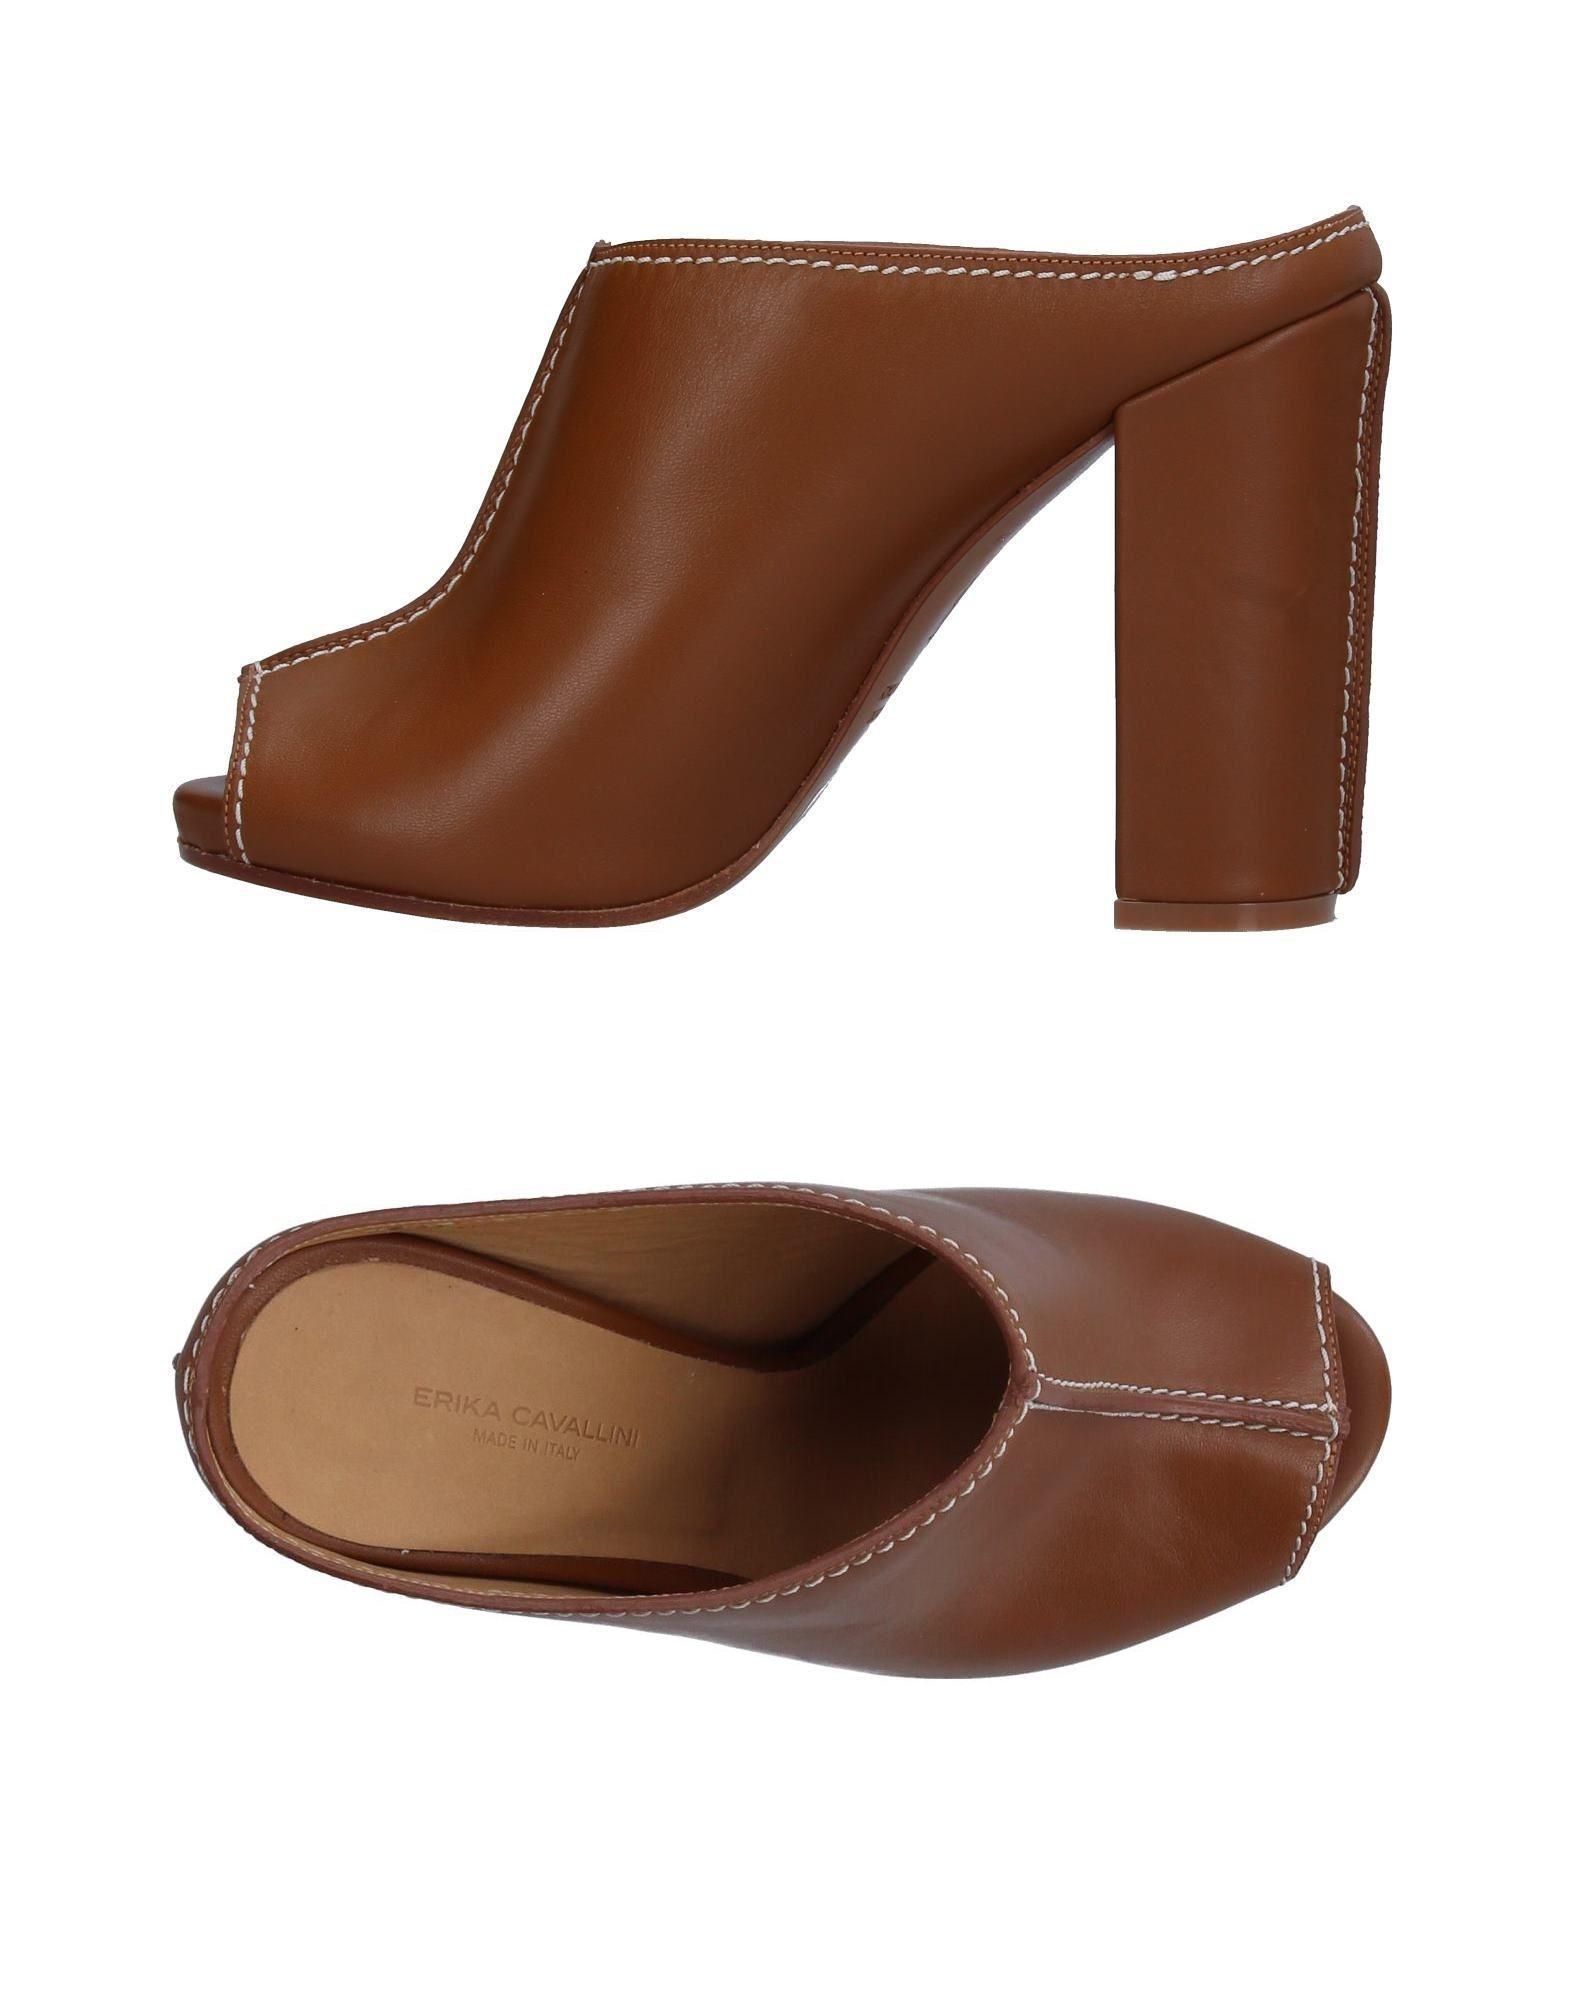 discount shop for ERIKA CAVALLINI Open-toe mules visit cheap price zdcnkLyR